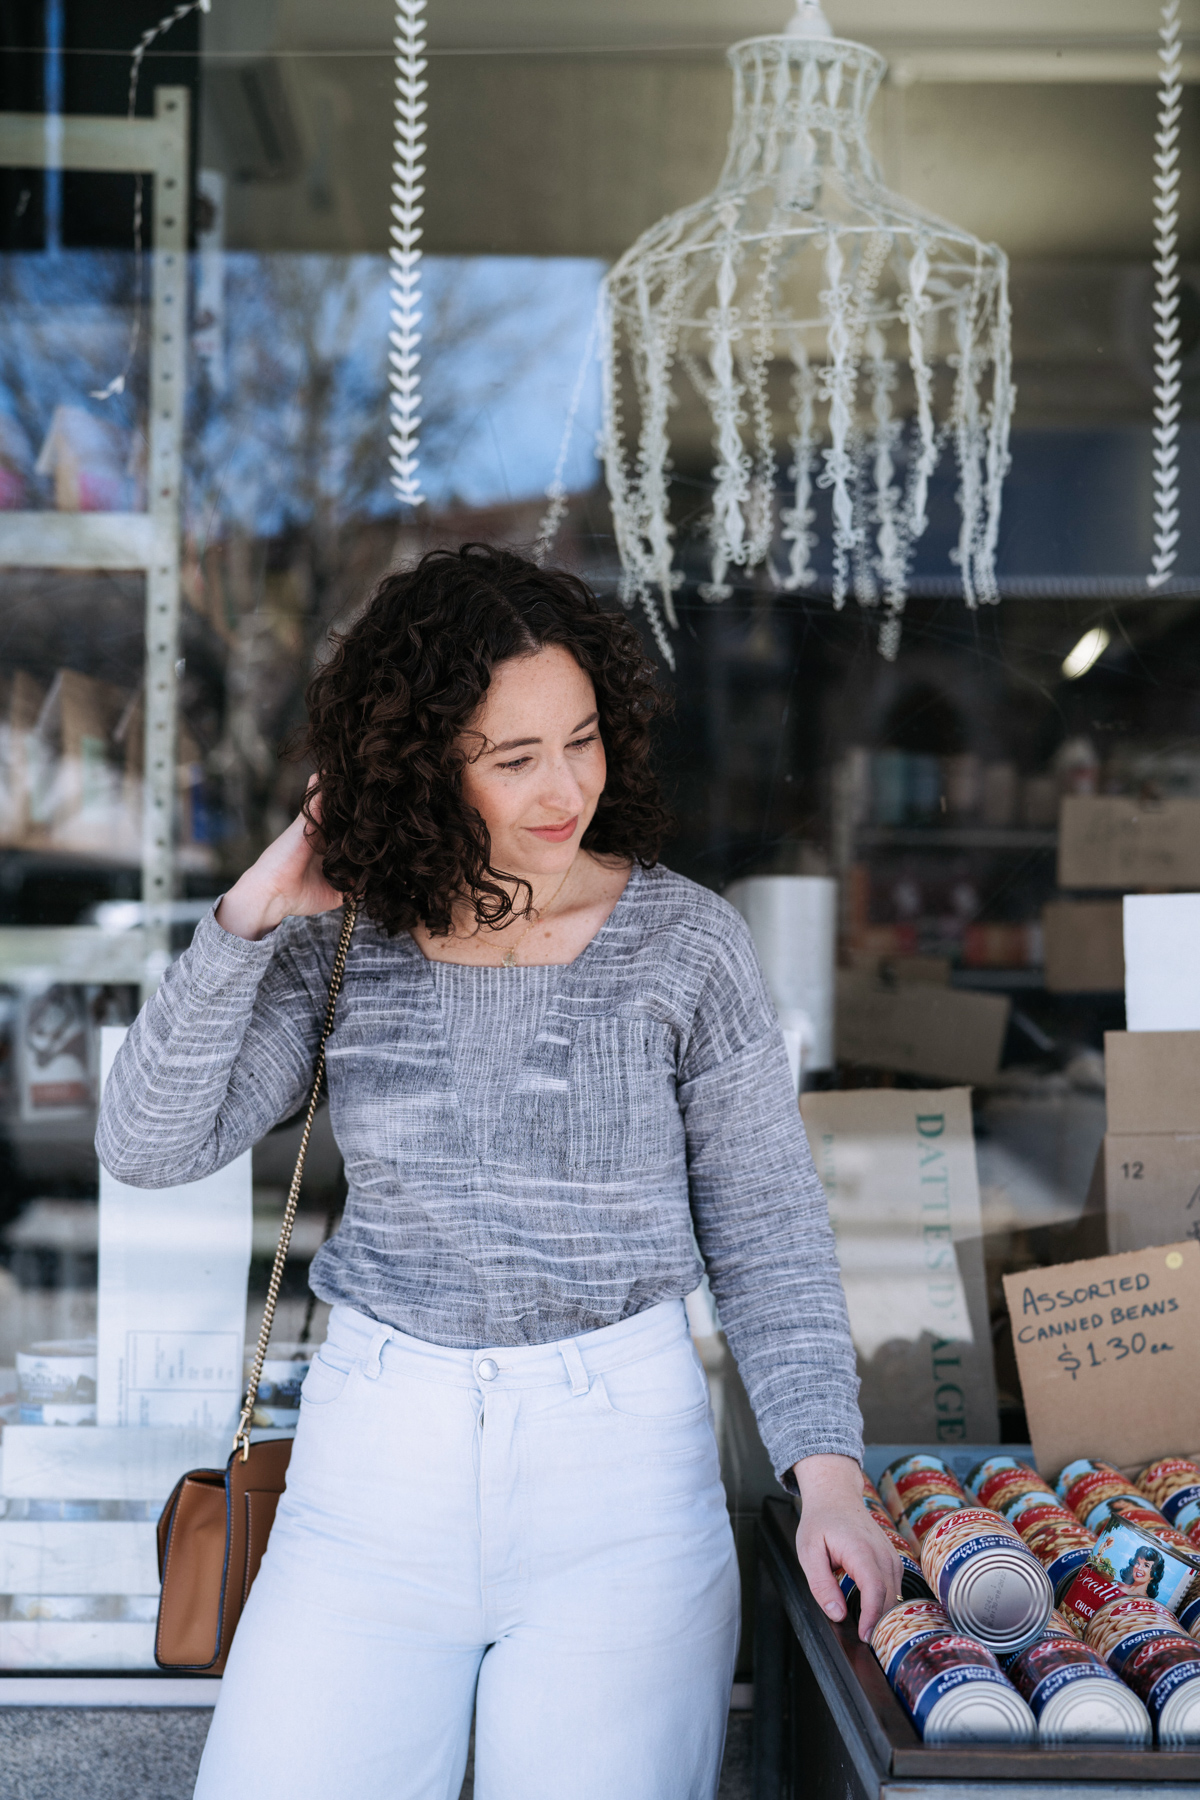 Megan Nielsen's Olive top sewing pattern - View C long sleeve variation   Megan Nielsen Patterns Blog